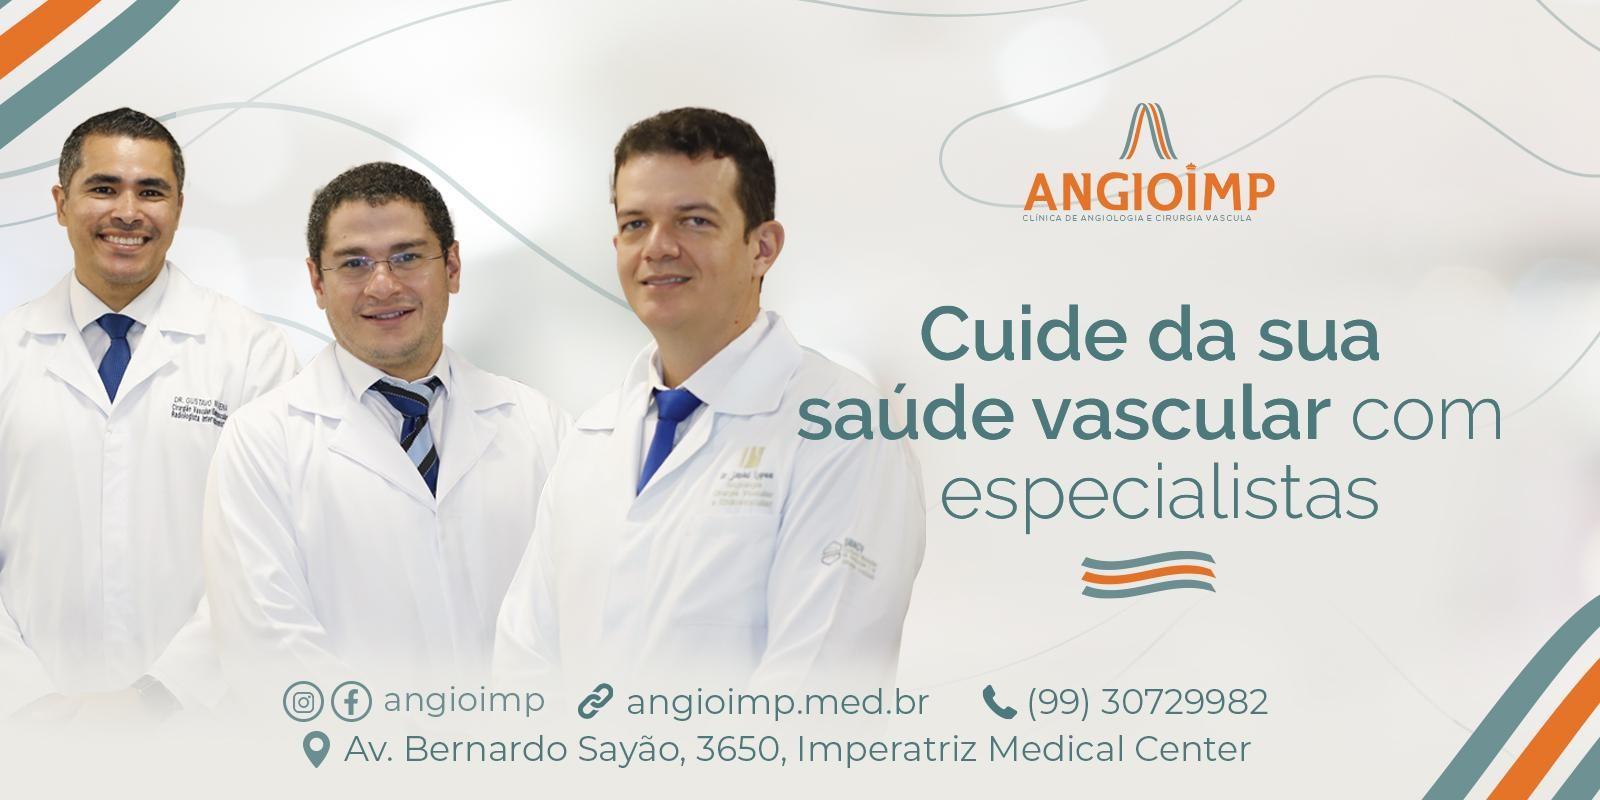 Angioimp - Clínica de Angiologia e Cirurgia Vascular